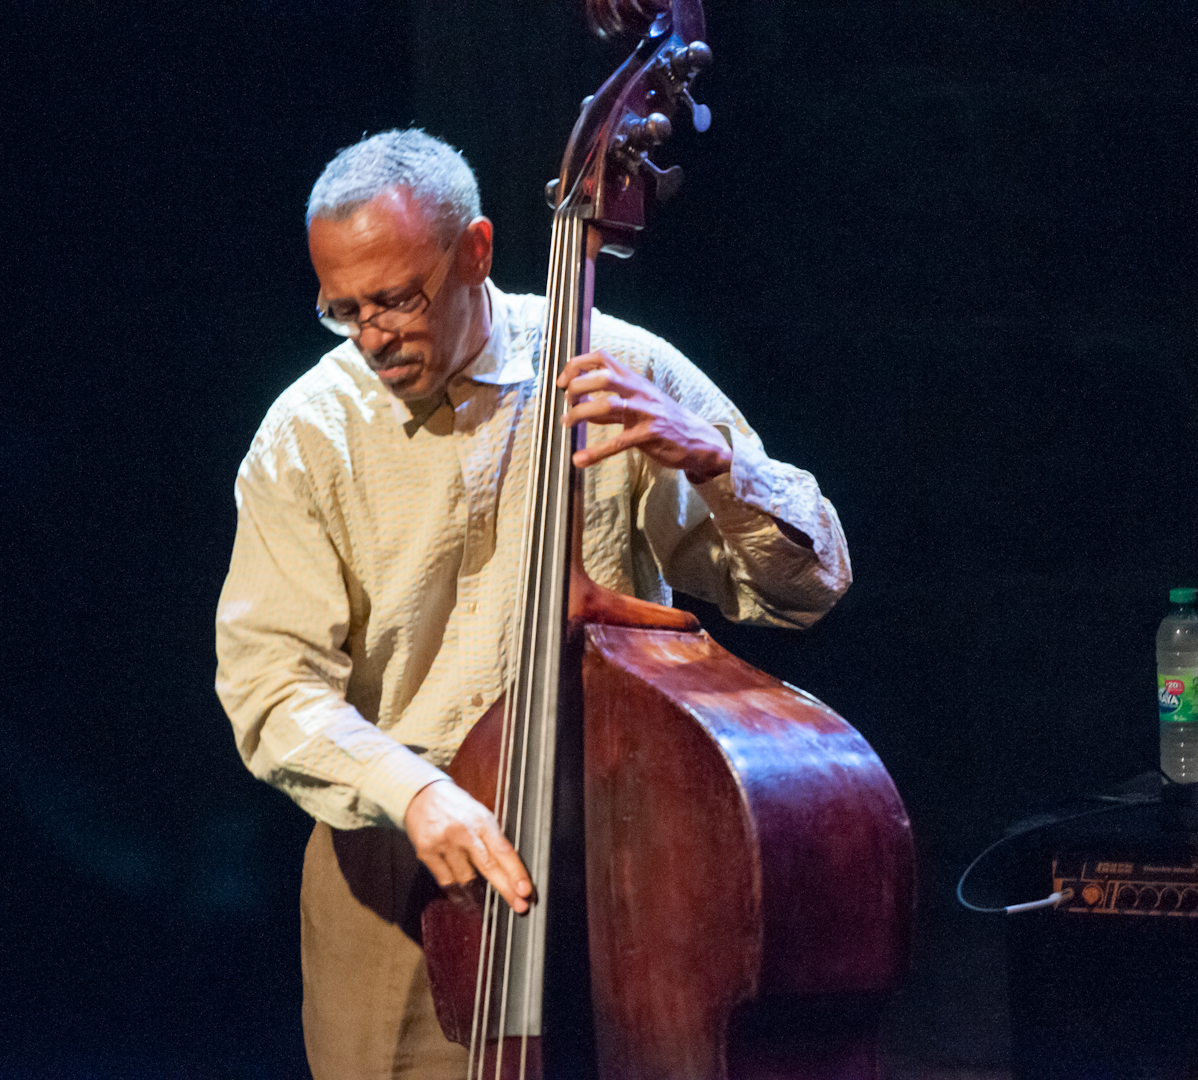 David Williams with the Cedar Walton Trio at the Montreal International Jazz Festival 2012